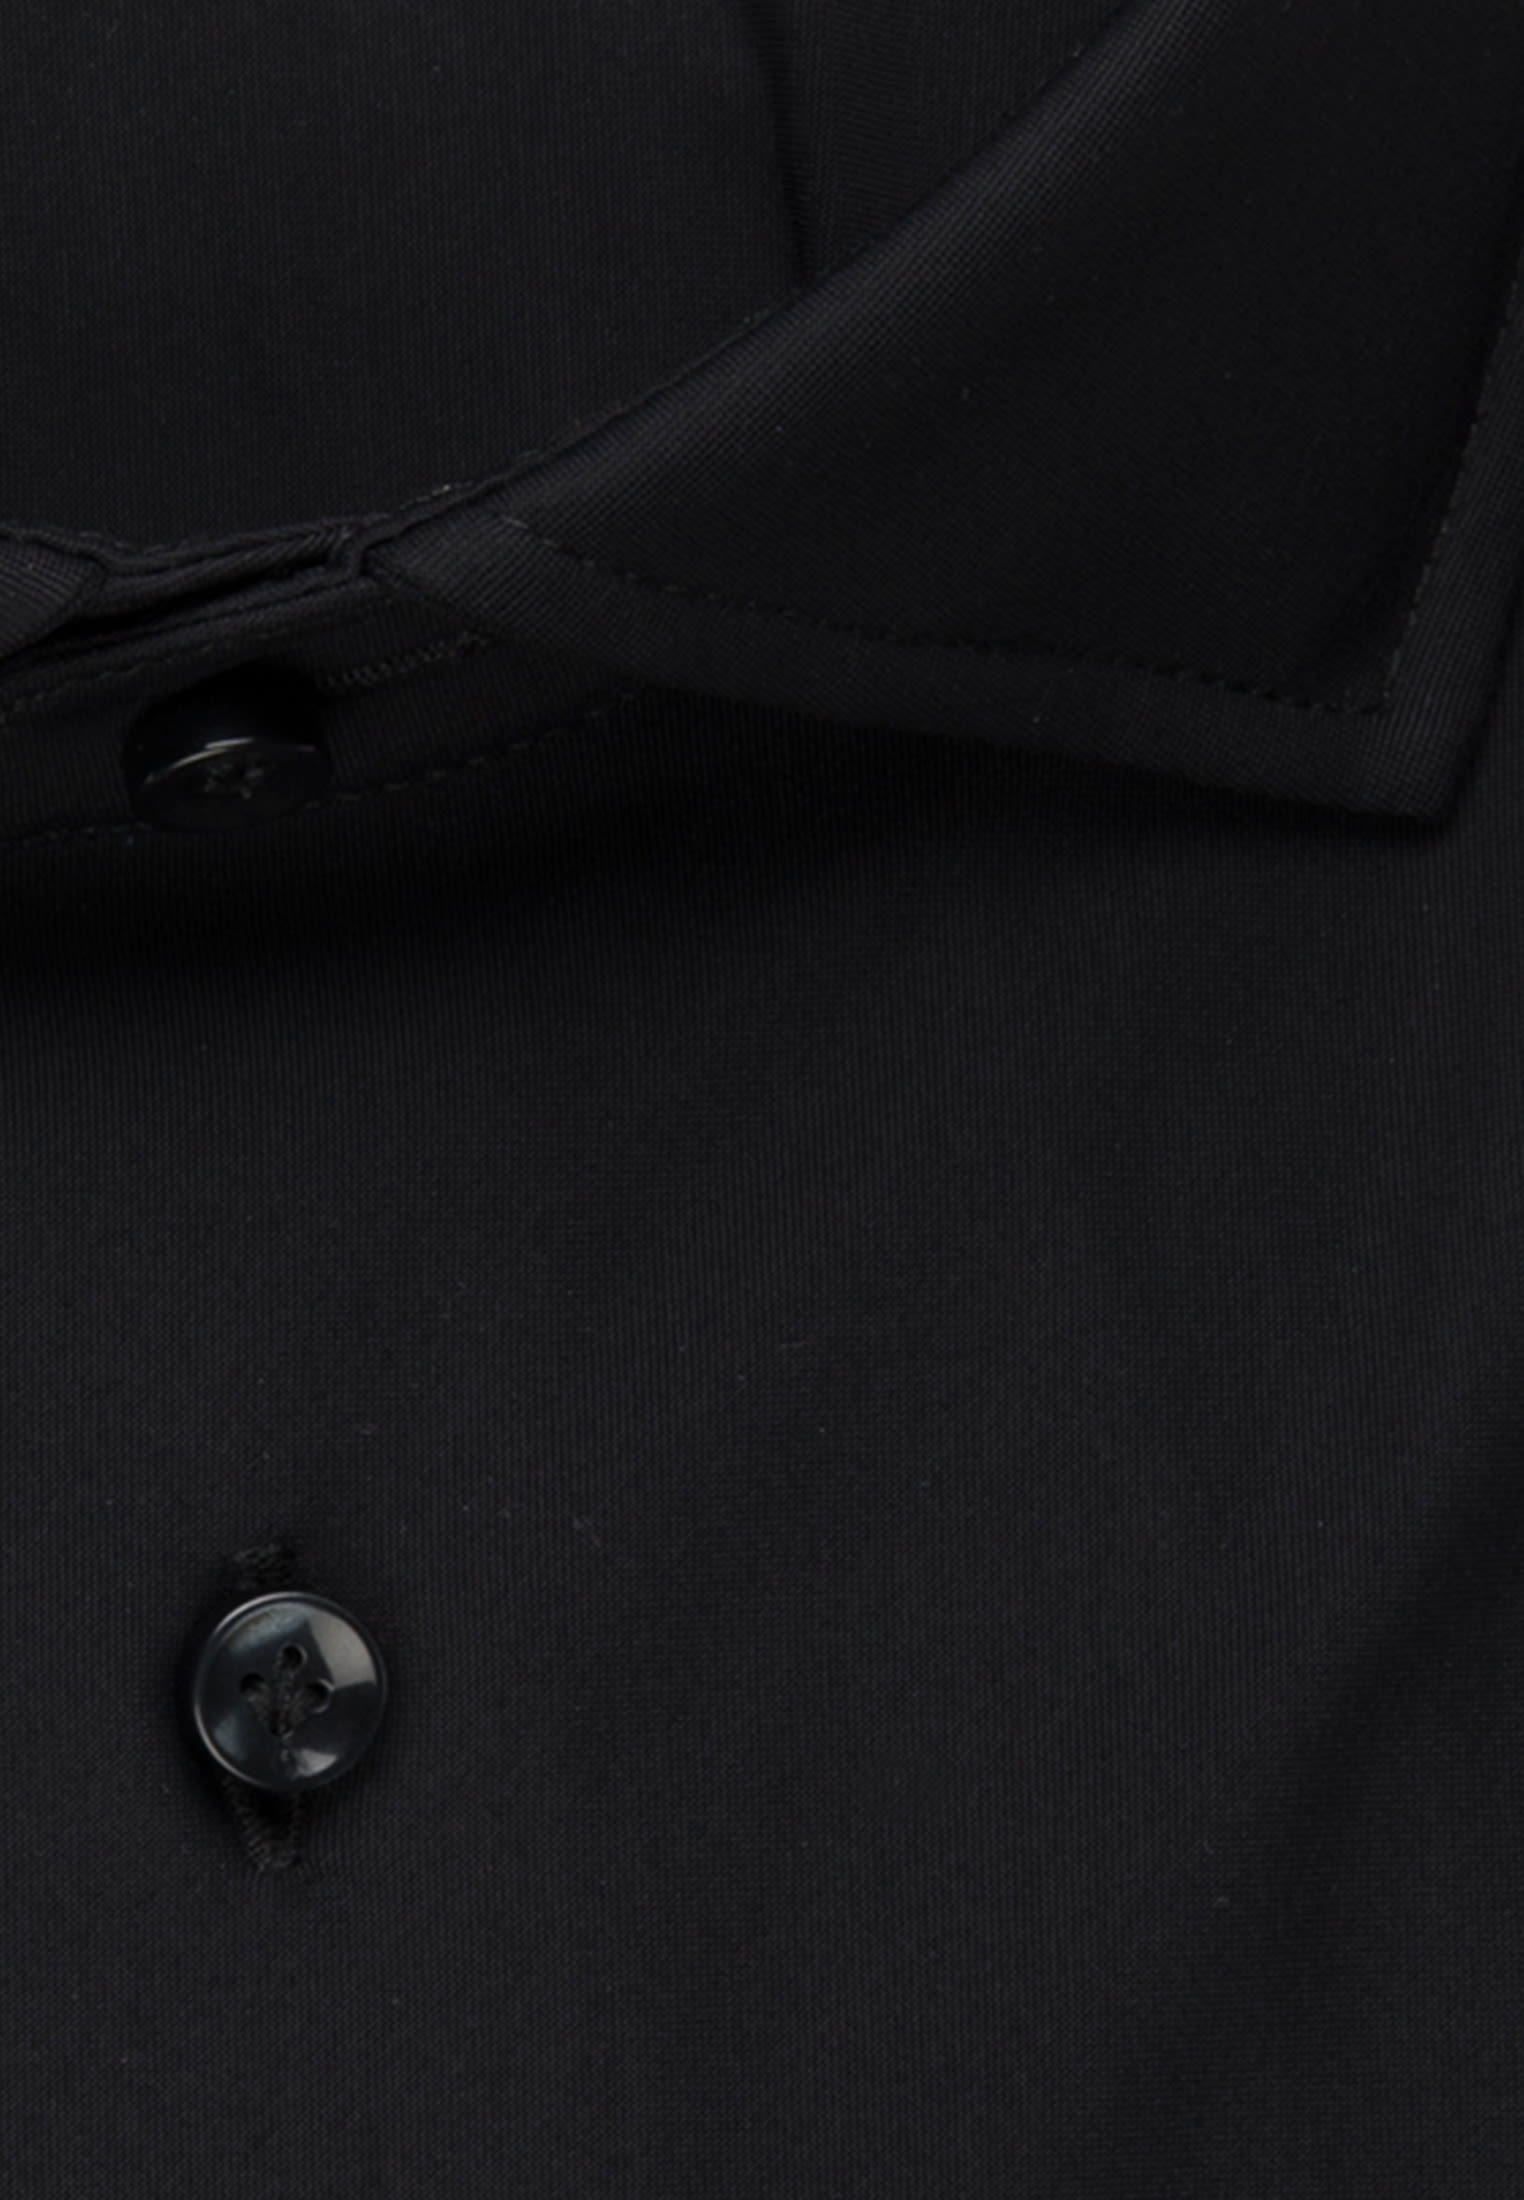 Phantasiebindung Smart Casual Hemd in Perfect Fit mit Haifischkragen in Schwarz    Jacques Britt Onlineshop